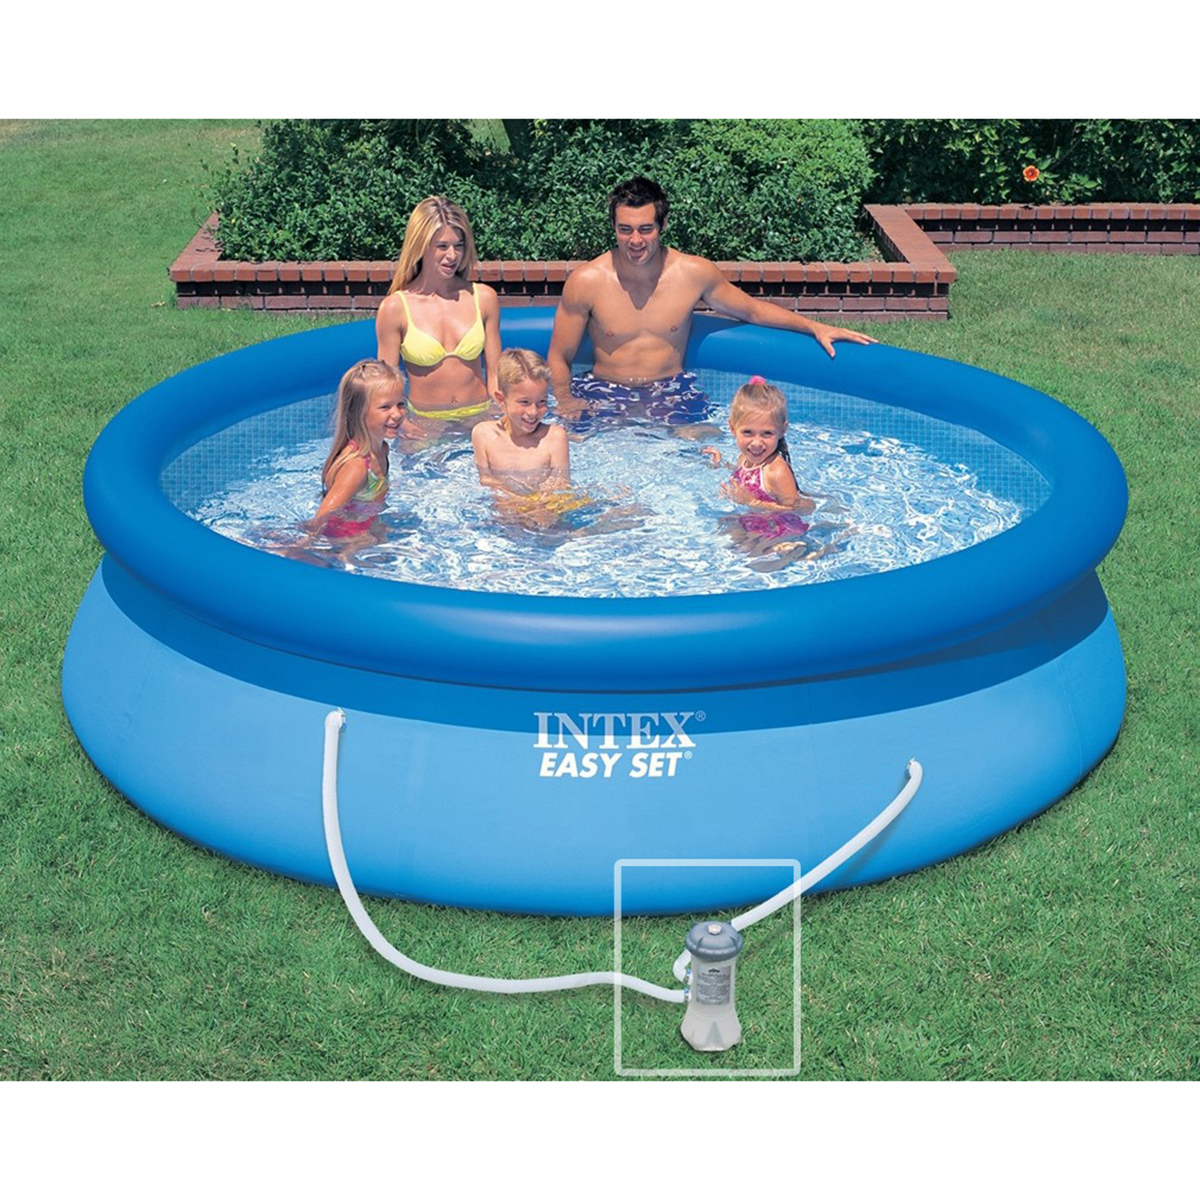 intex 28122fr piscine hors sol autoportante ronde pvc 305 cm comparer avec. Black Bedroom Furniture Sets. Home Design Ideas